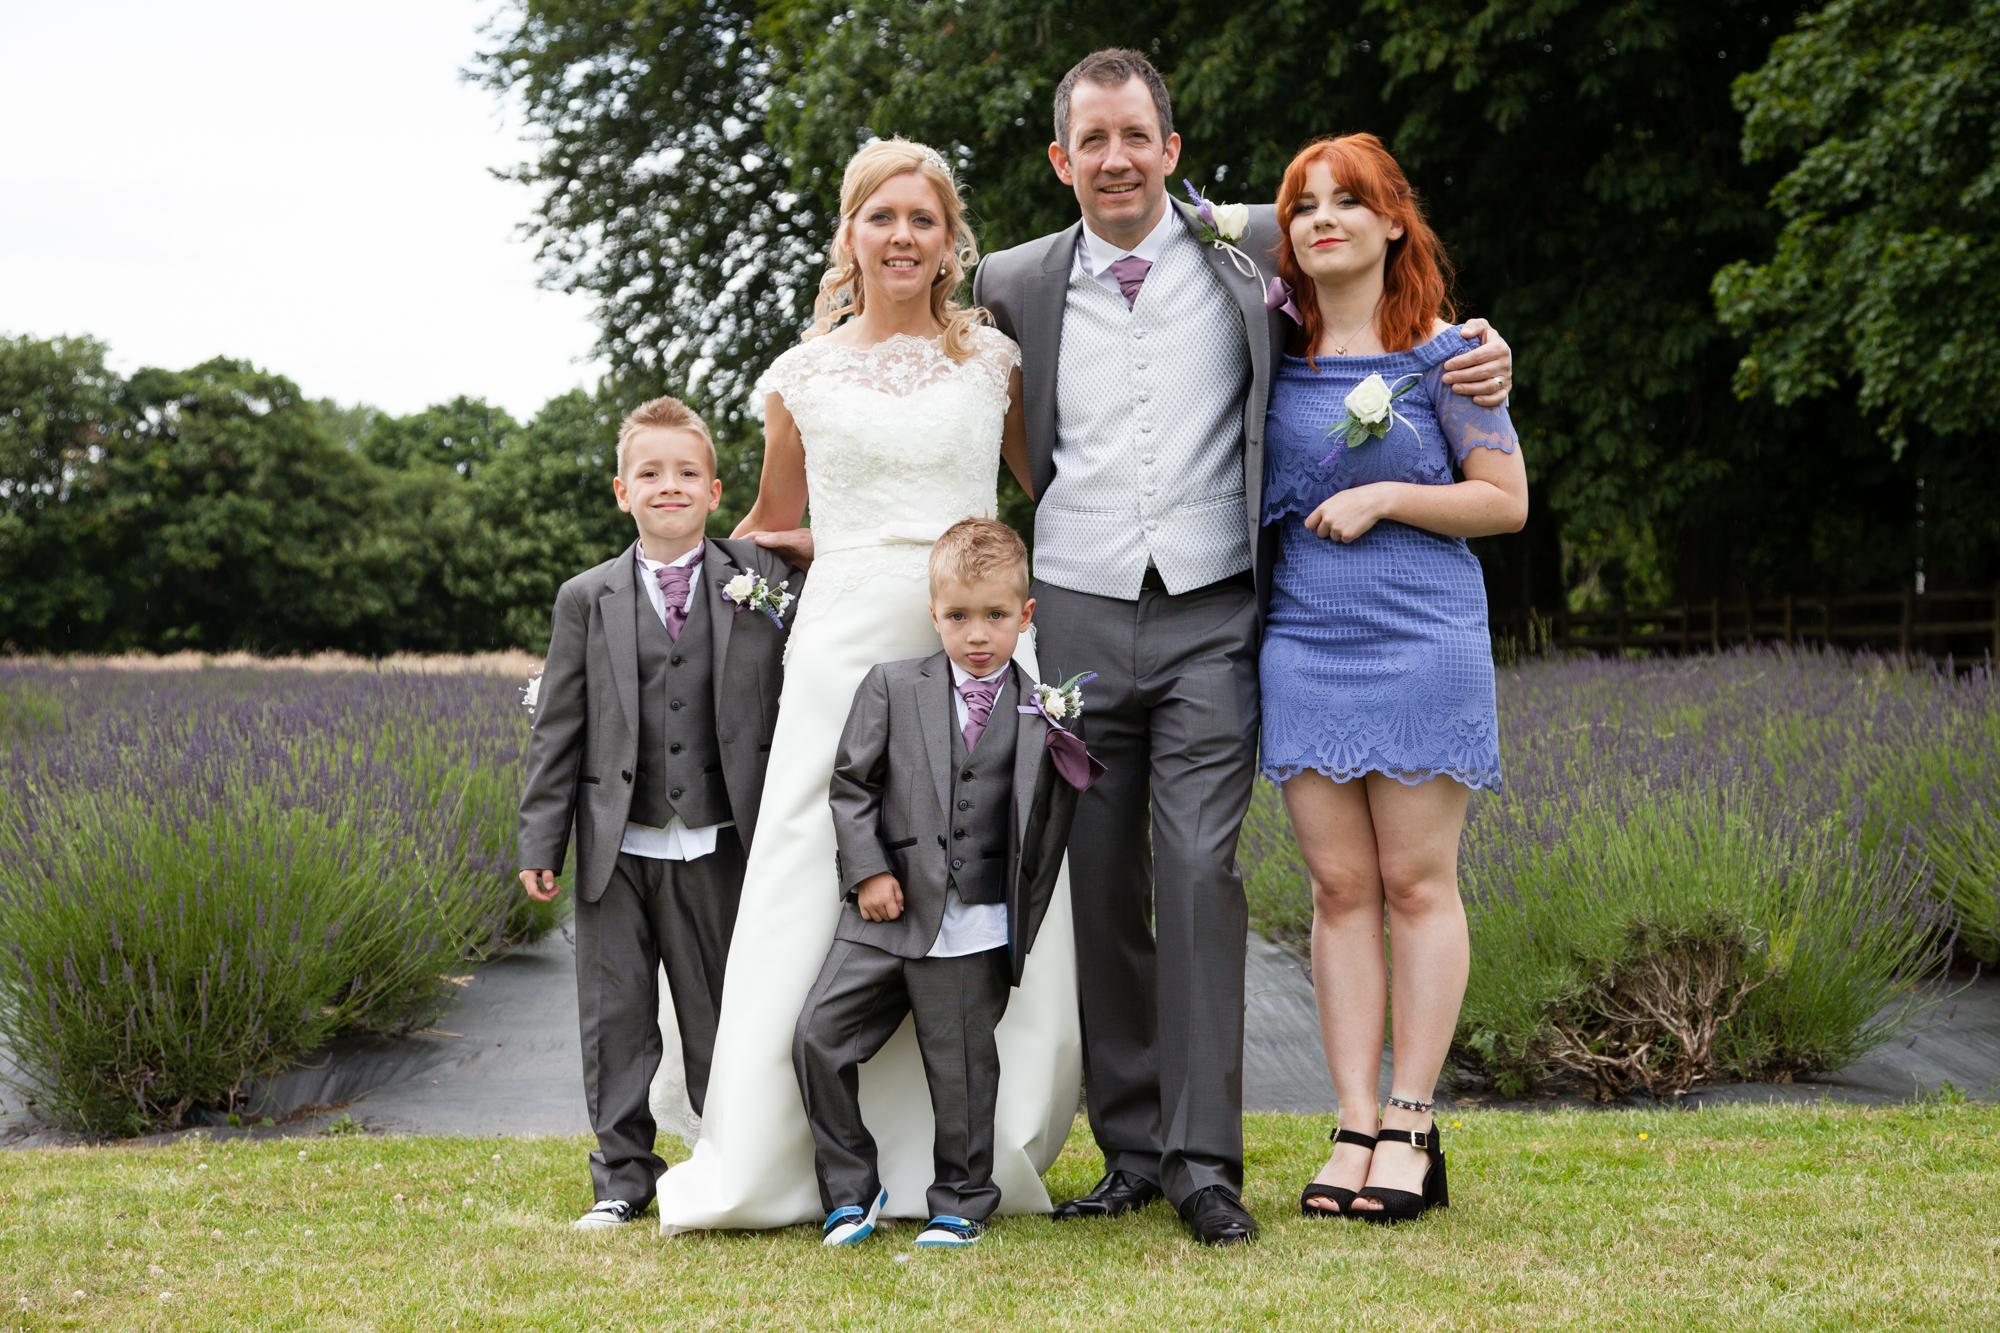 110715_LisaCraigJohnson_Wedding_5806398_WebWM.jpg